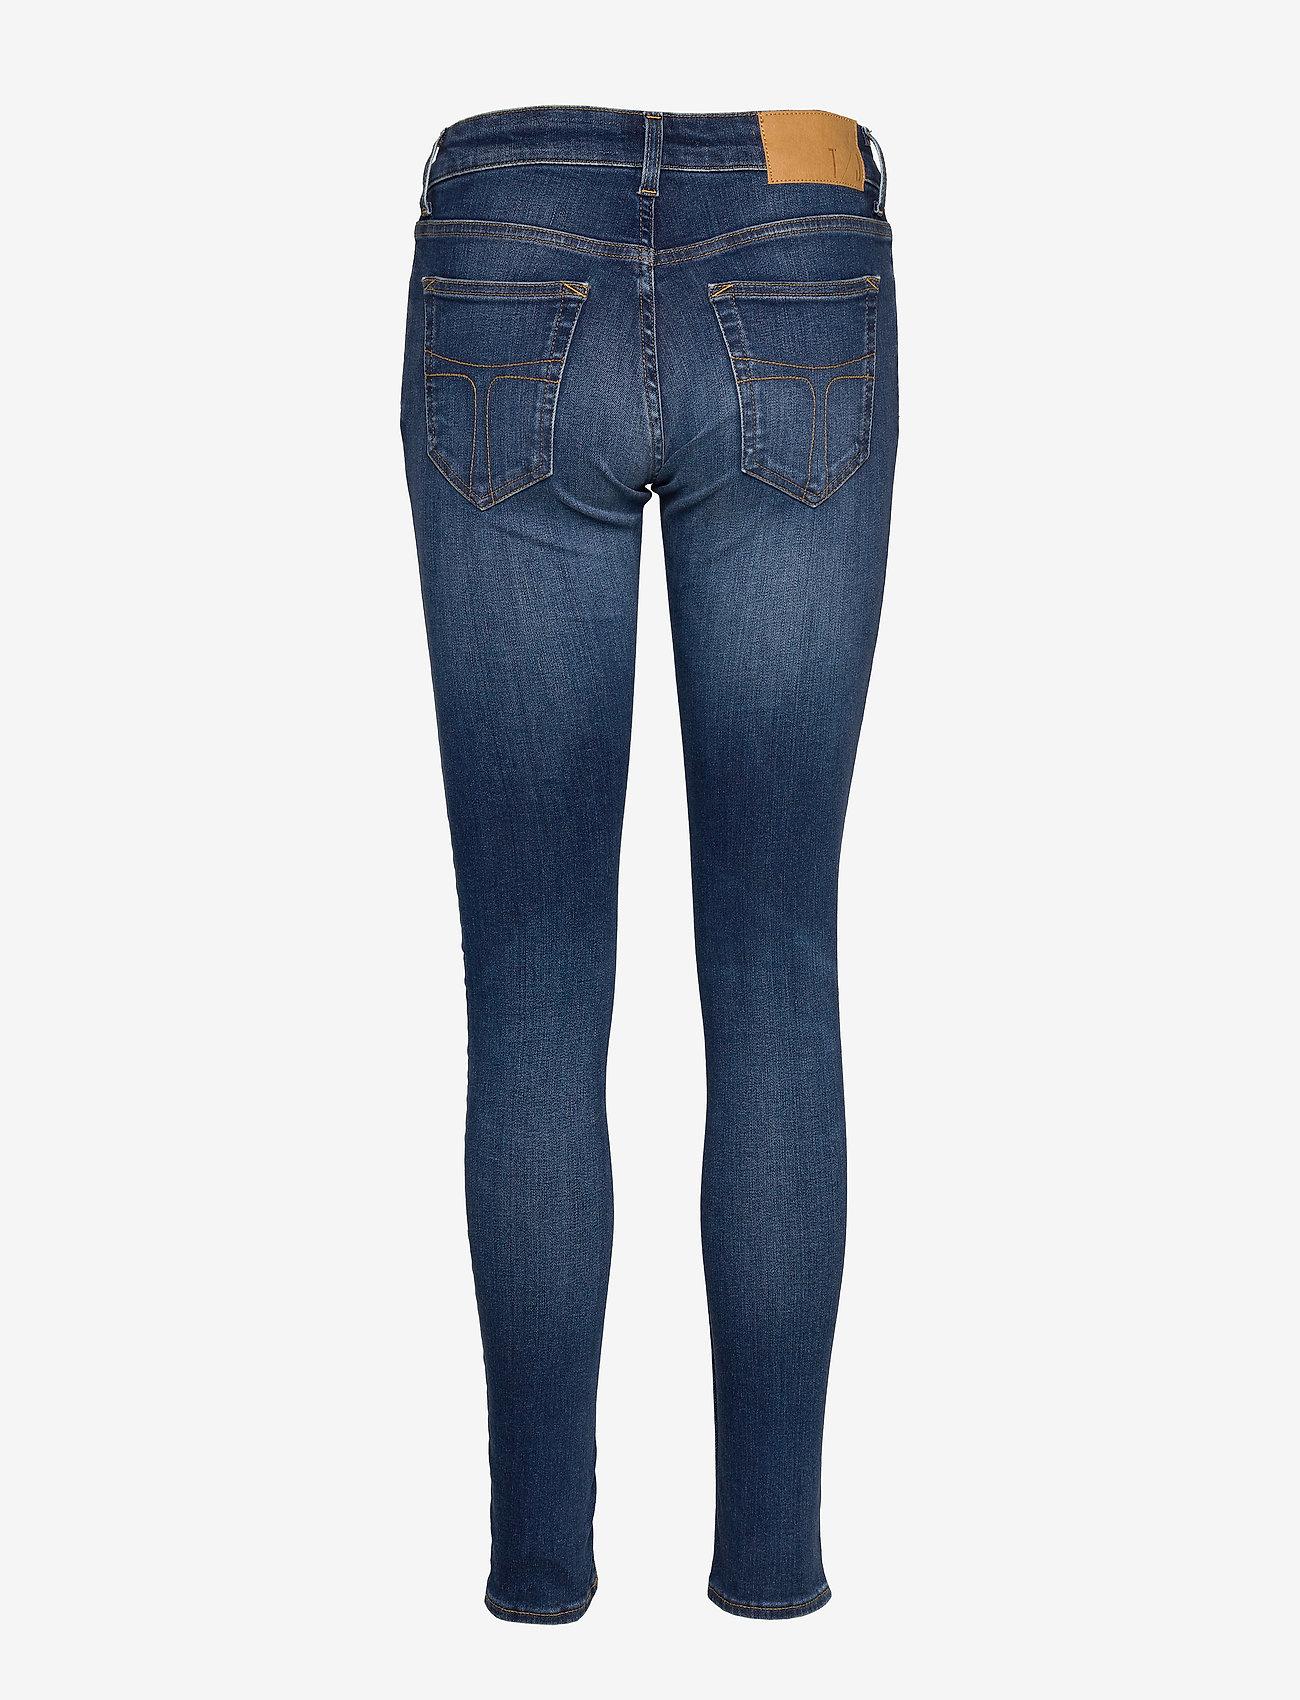 Tiger of Sweden Jeans - SLIGHT - wąskie dżinsy - royal blue - 1